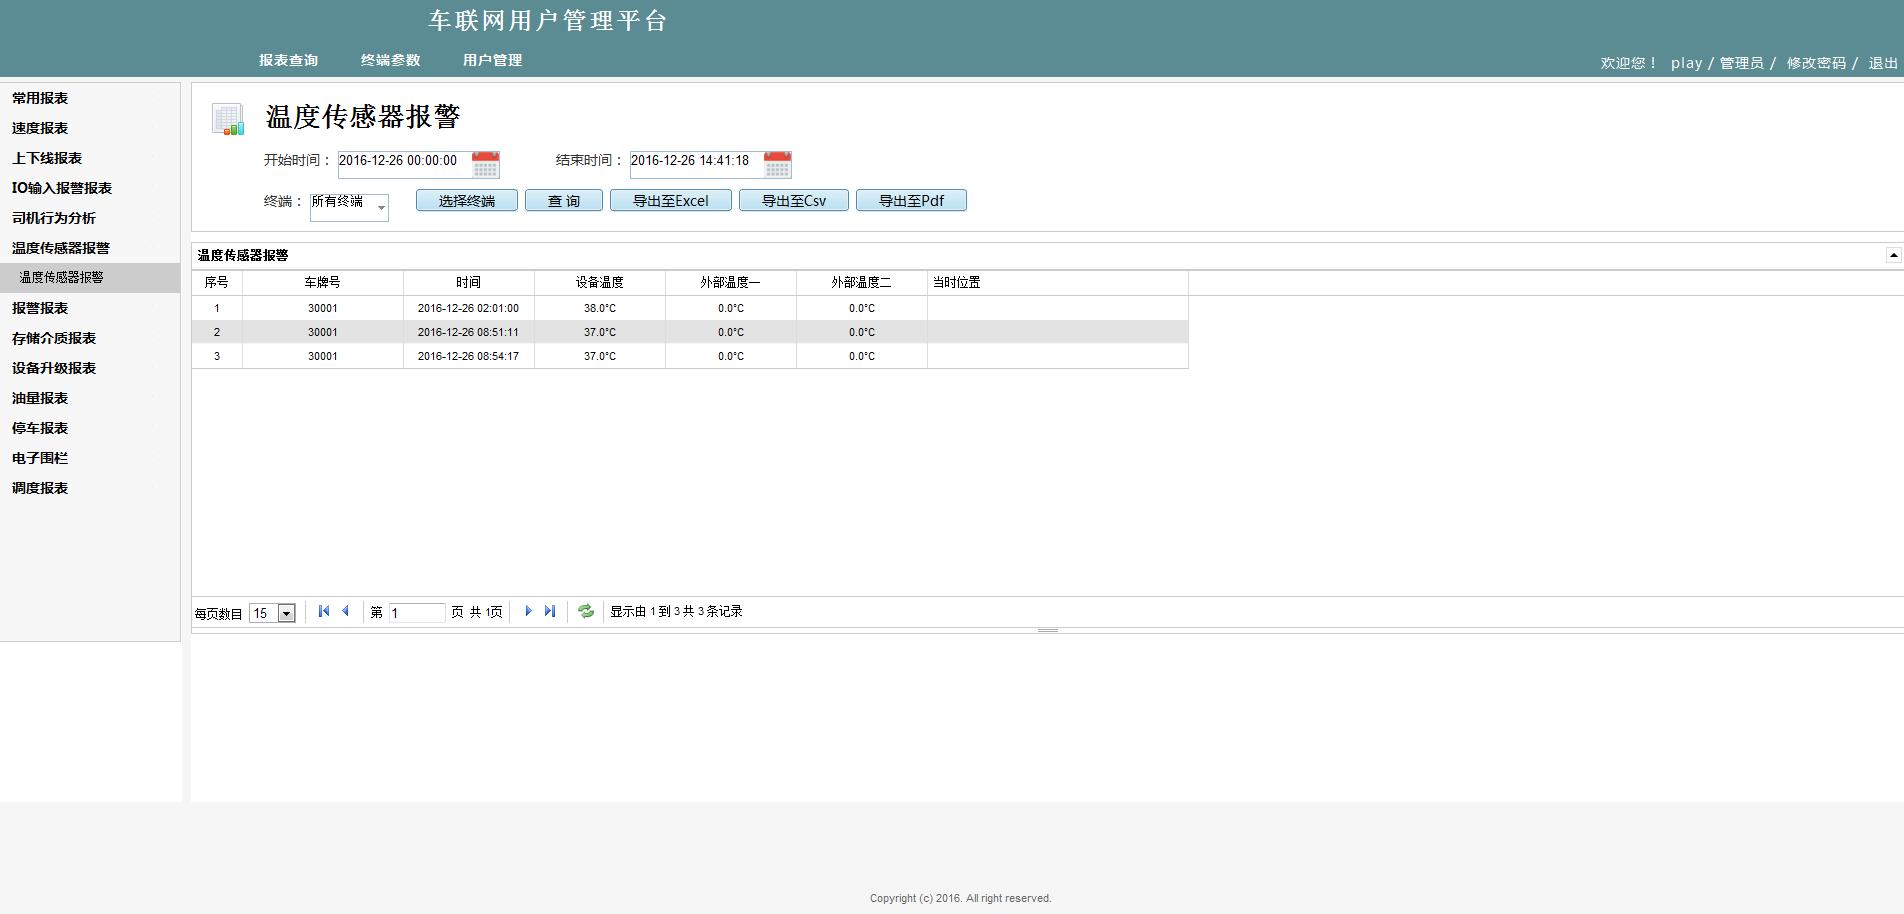 IVMS WEB客户端——智能车辆管理系统平台 第6张